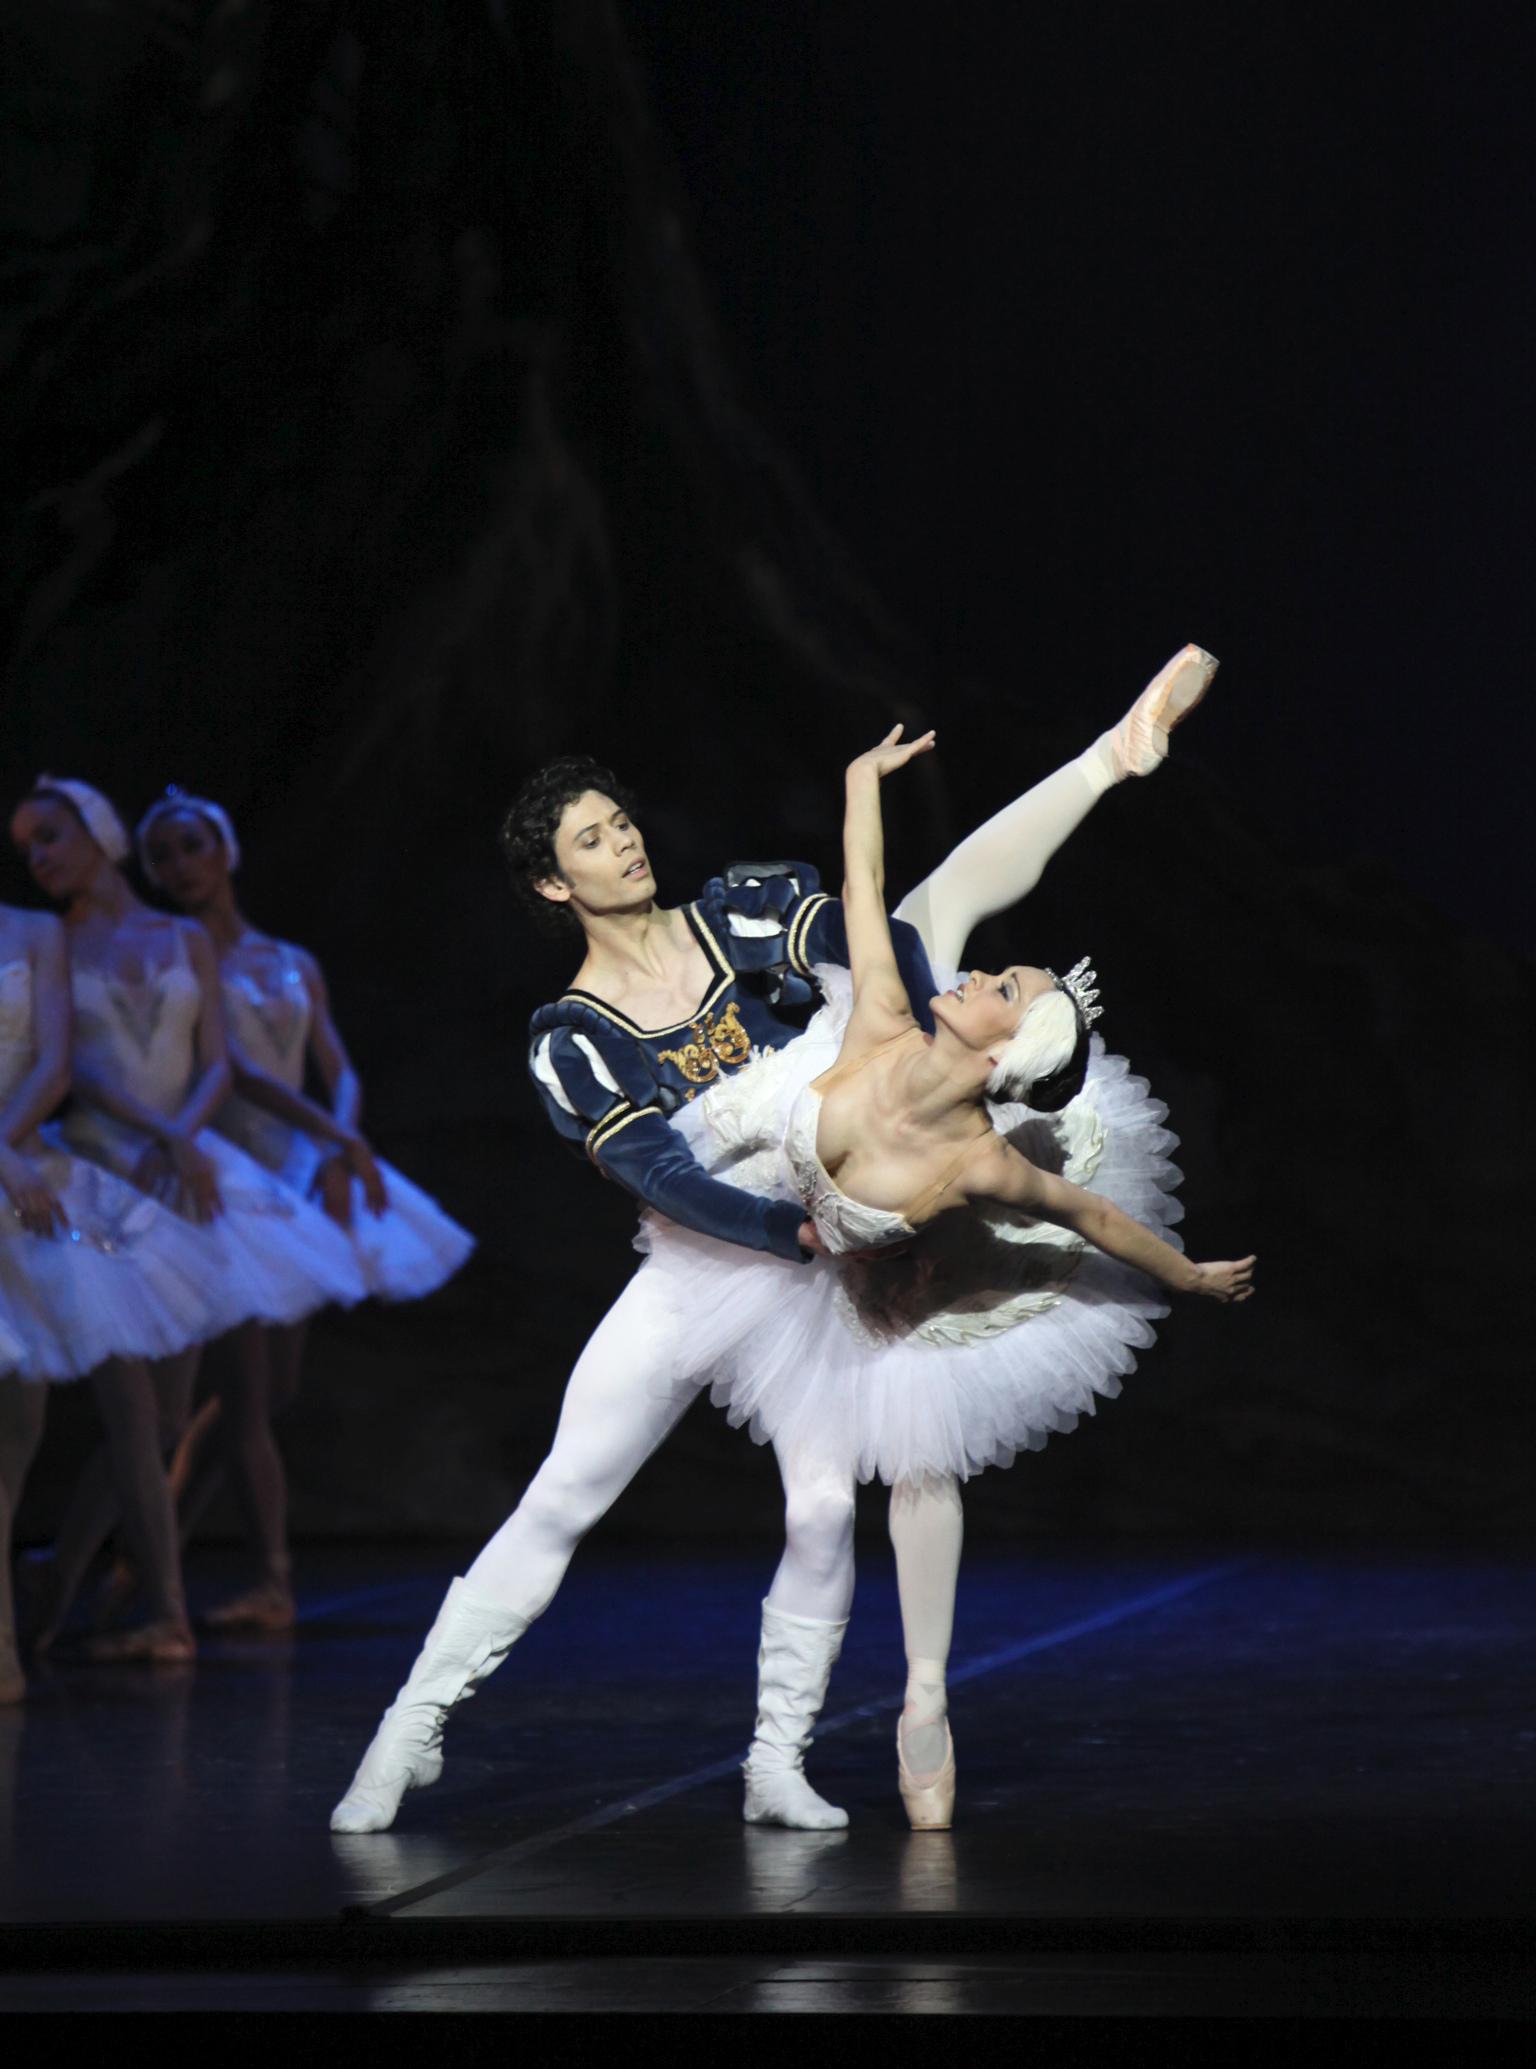 two ballet dancers in swan lake